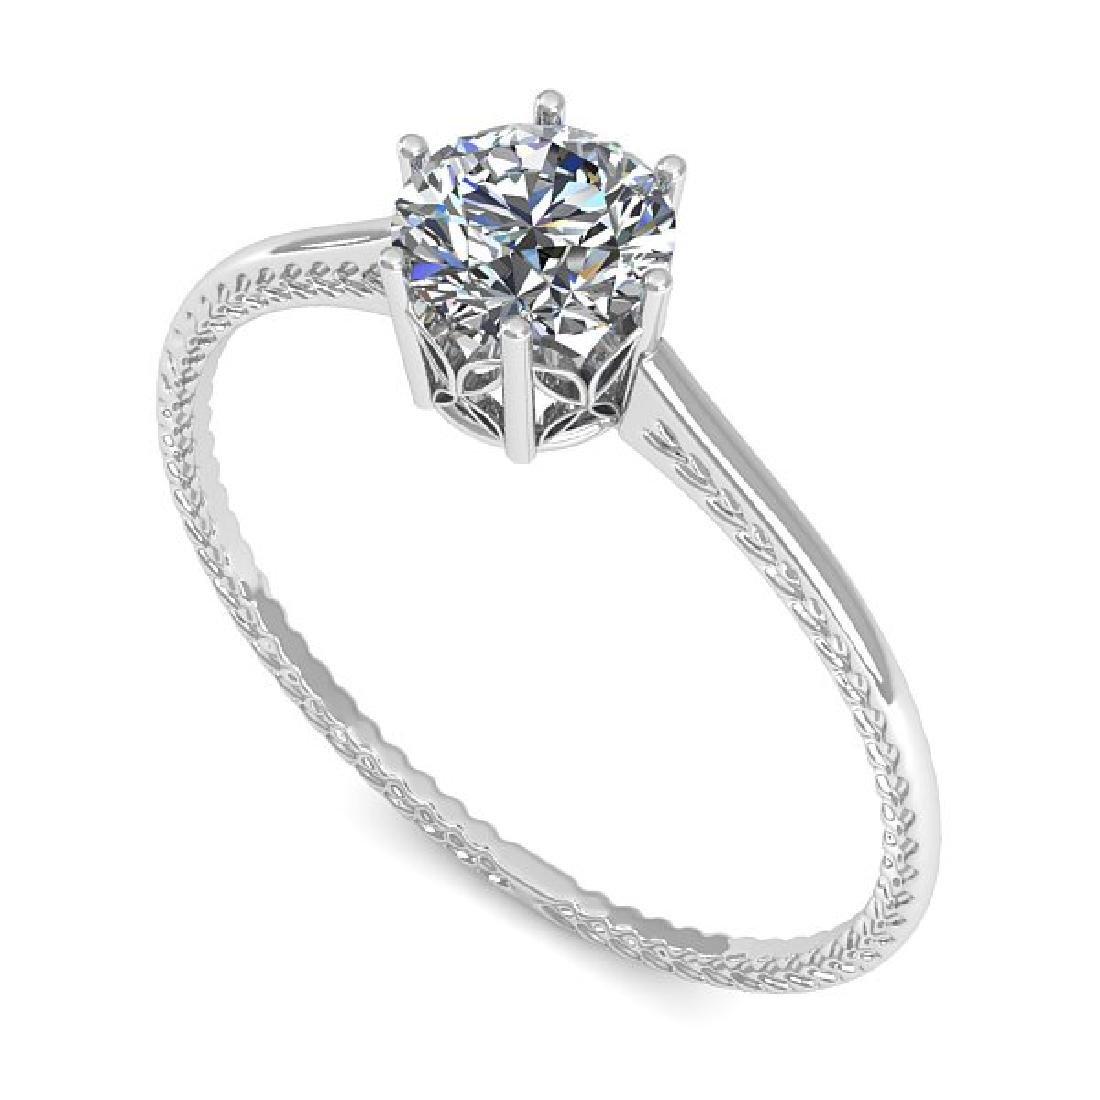 0.51 CTW VS/SI Diamond Art Deco Ring 14K White Gold - 2